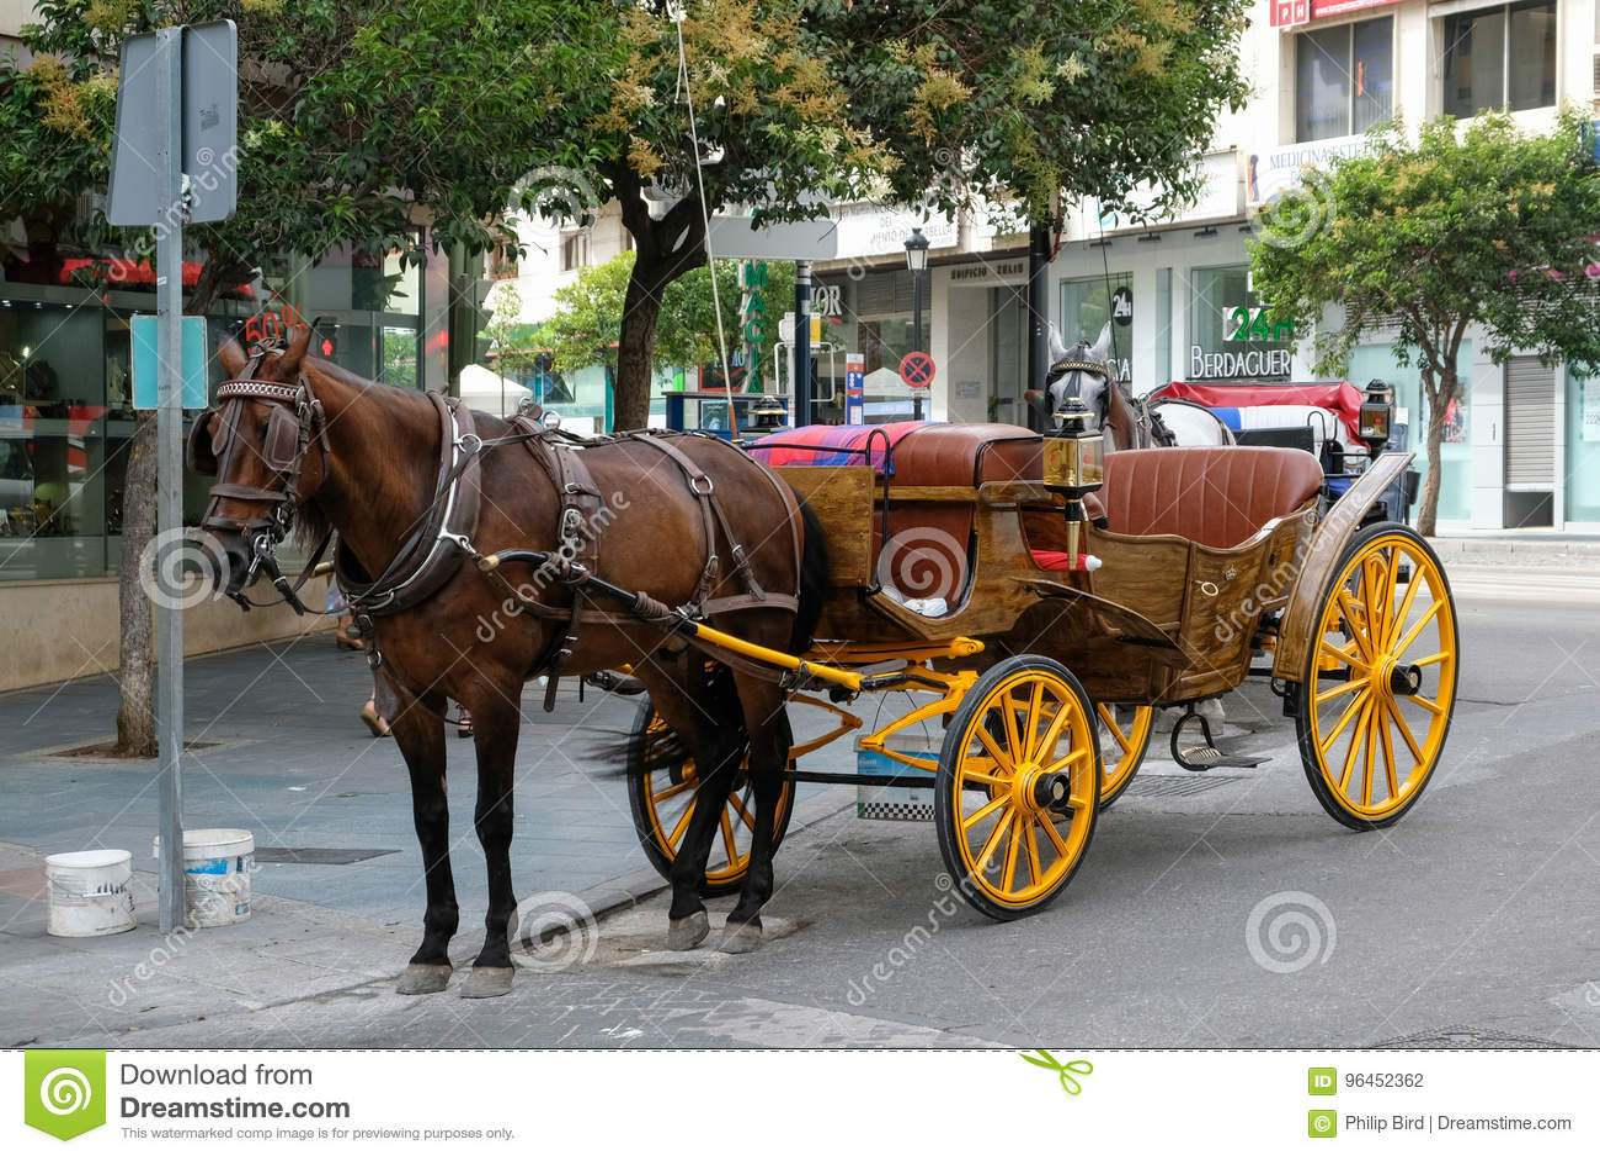 MARBELLA, ANDALUCIA/SPAIN - LIPIEC 6: Koń i fracht w Marbe